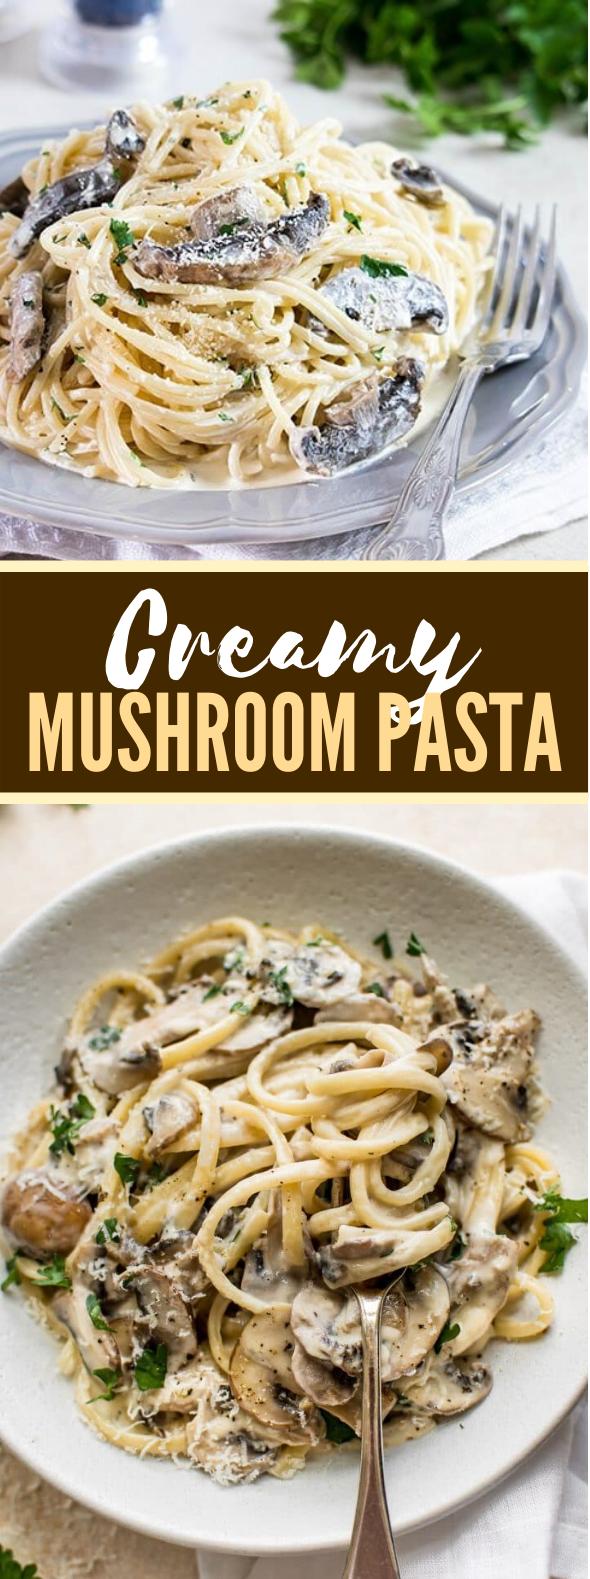 Creamy Mushroom Pasta #vegetarian #weeknightdinner